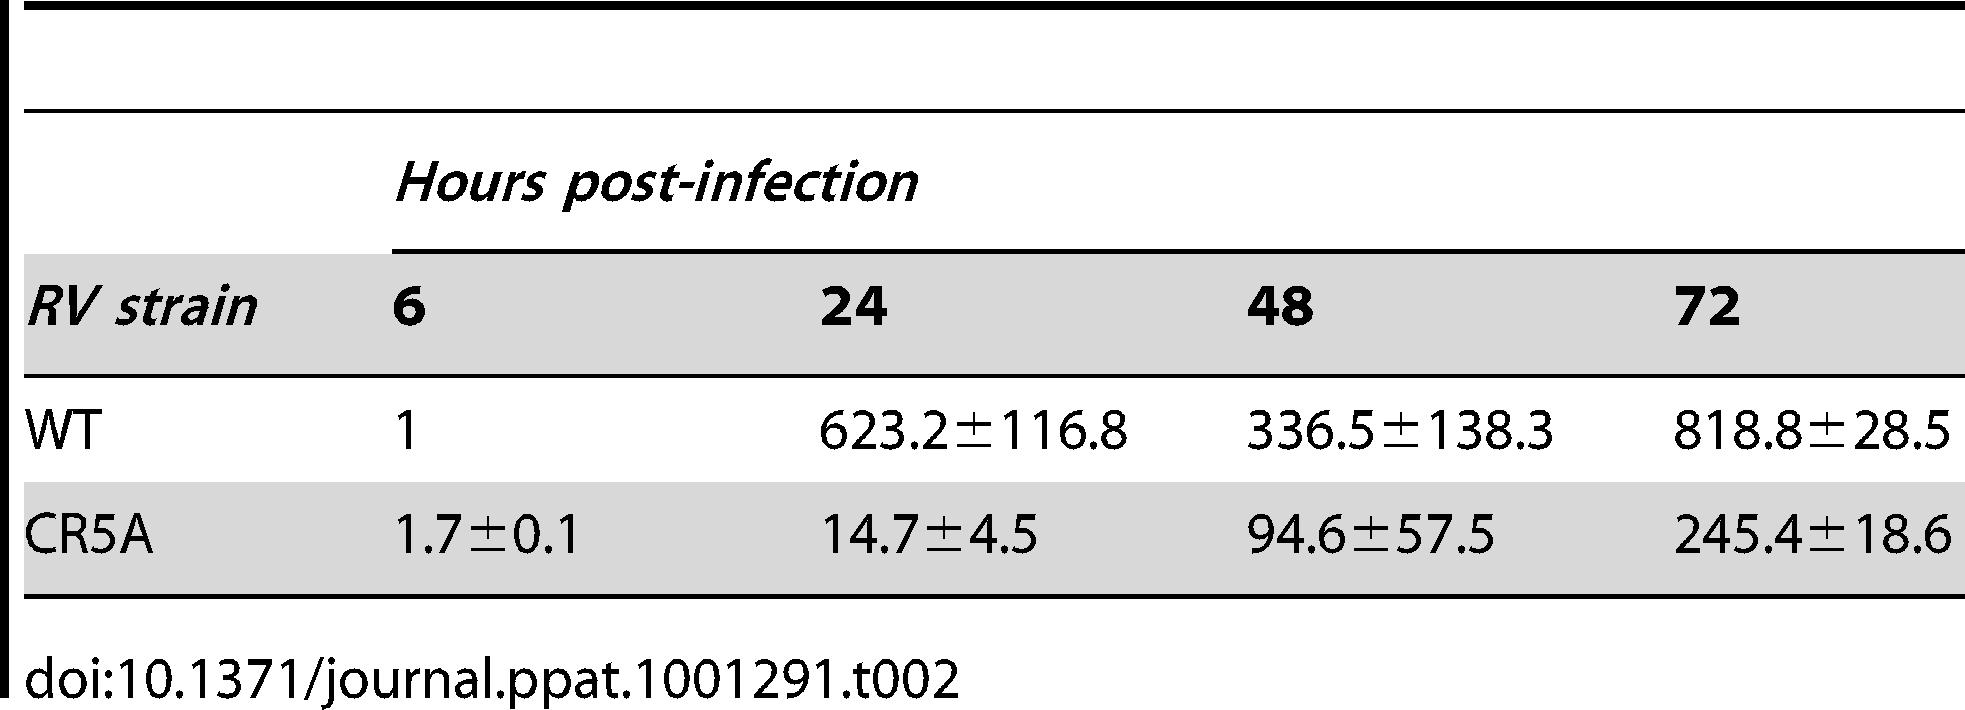 Relative genomic RNA levels in infected Vero cells.